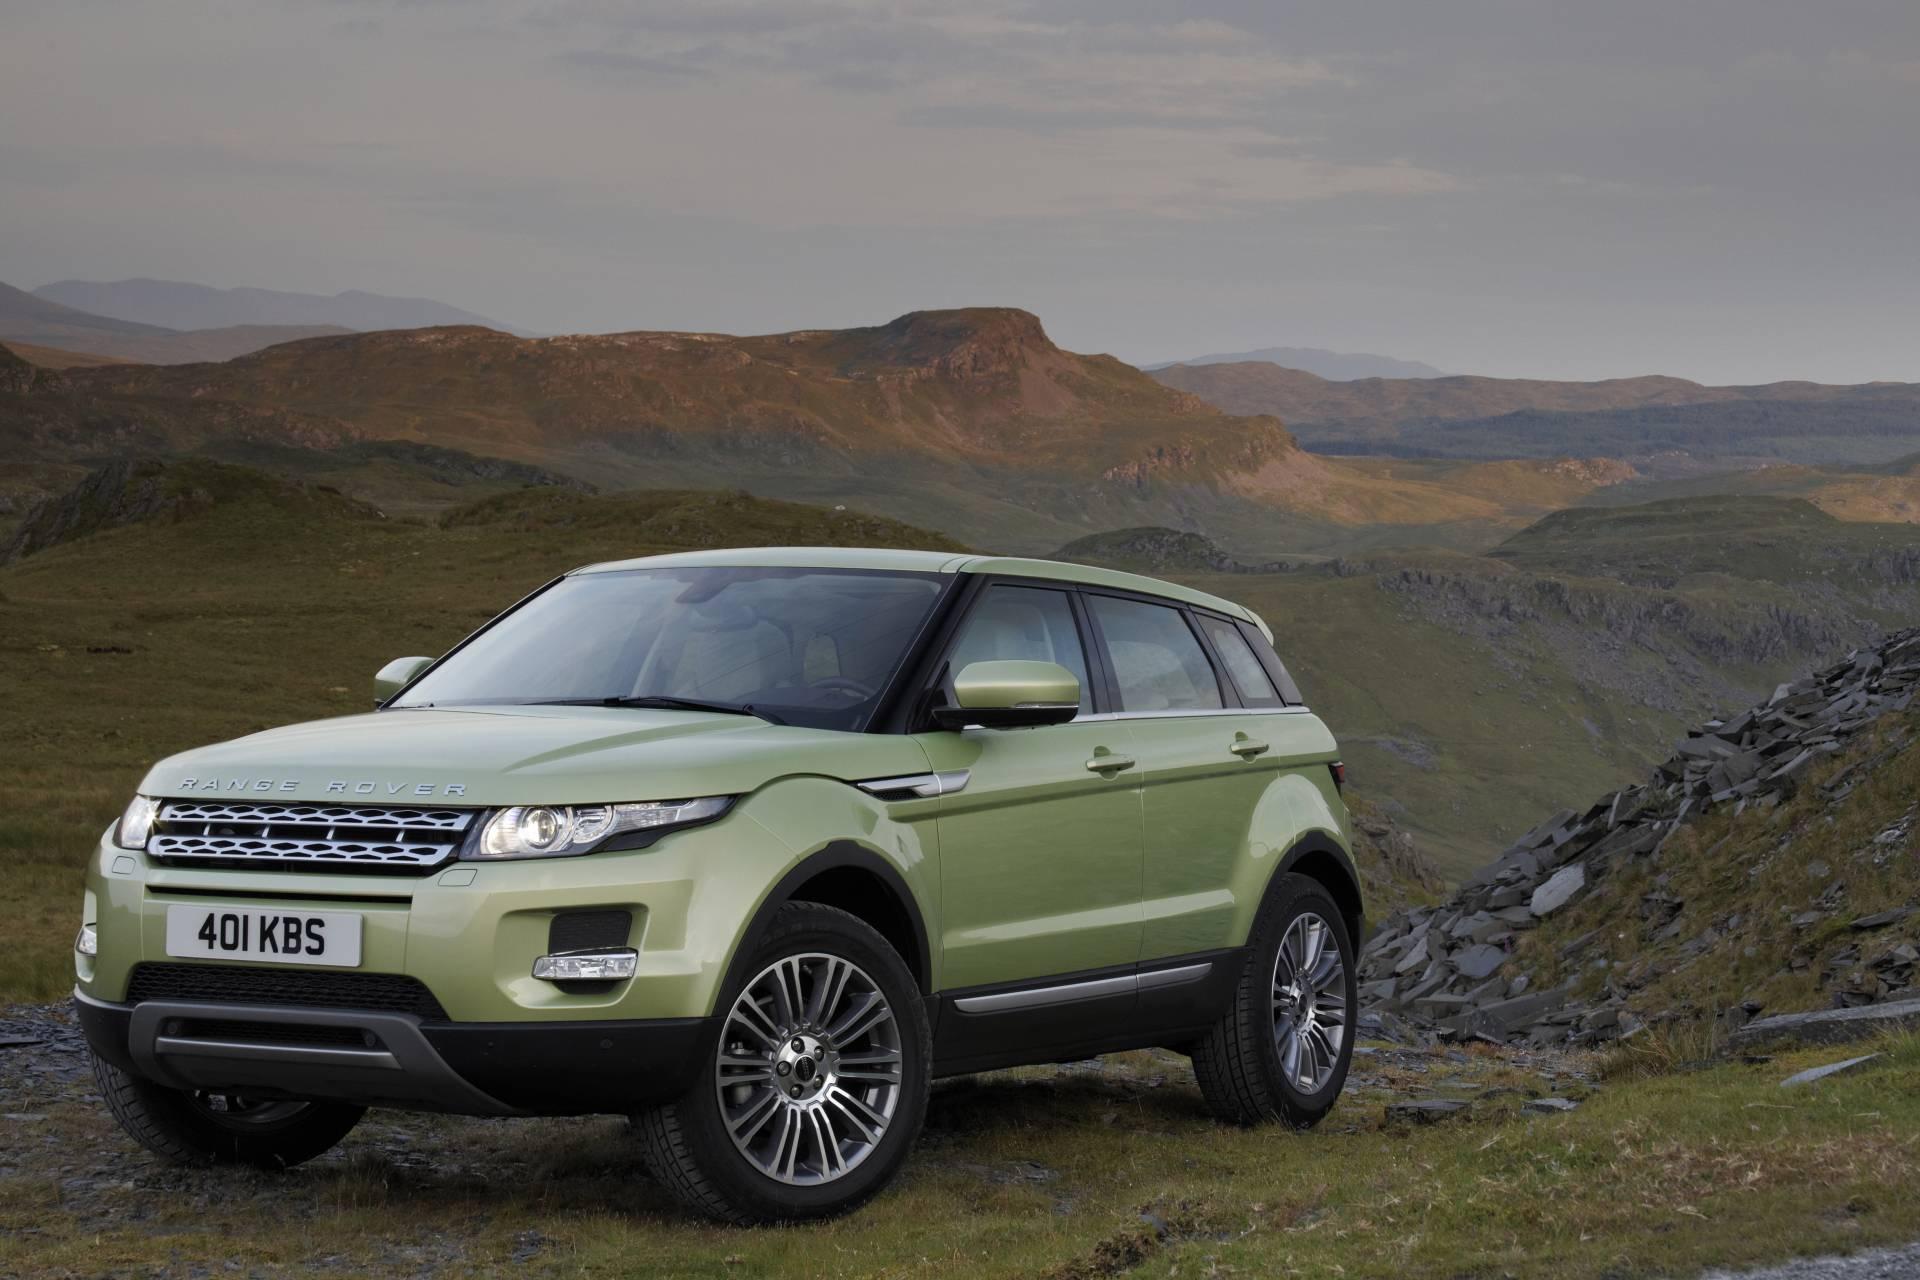 https://www.conceptcarz.com/images/Land%20Rover/2012-Land-Rover-Range-Rover-Evoque-01.jpg